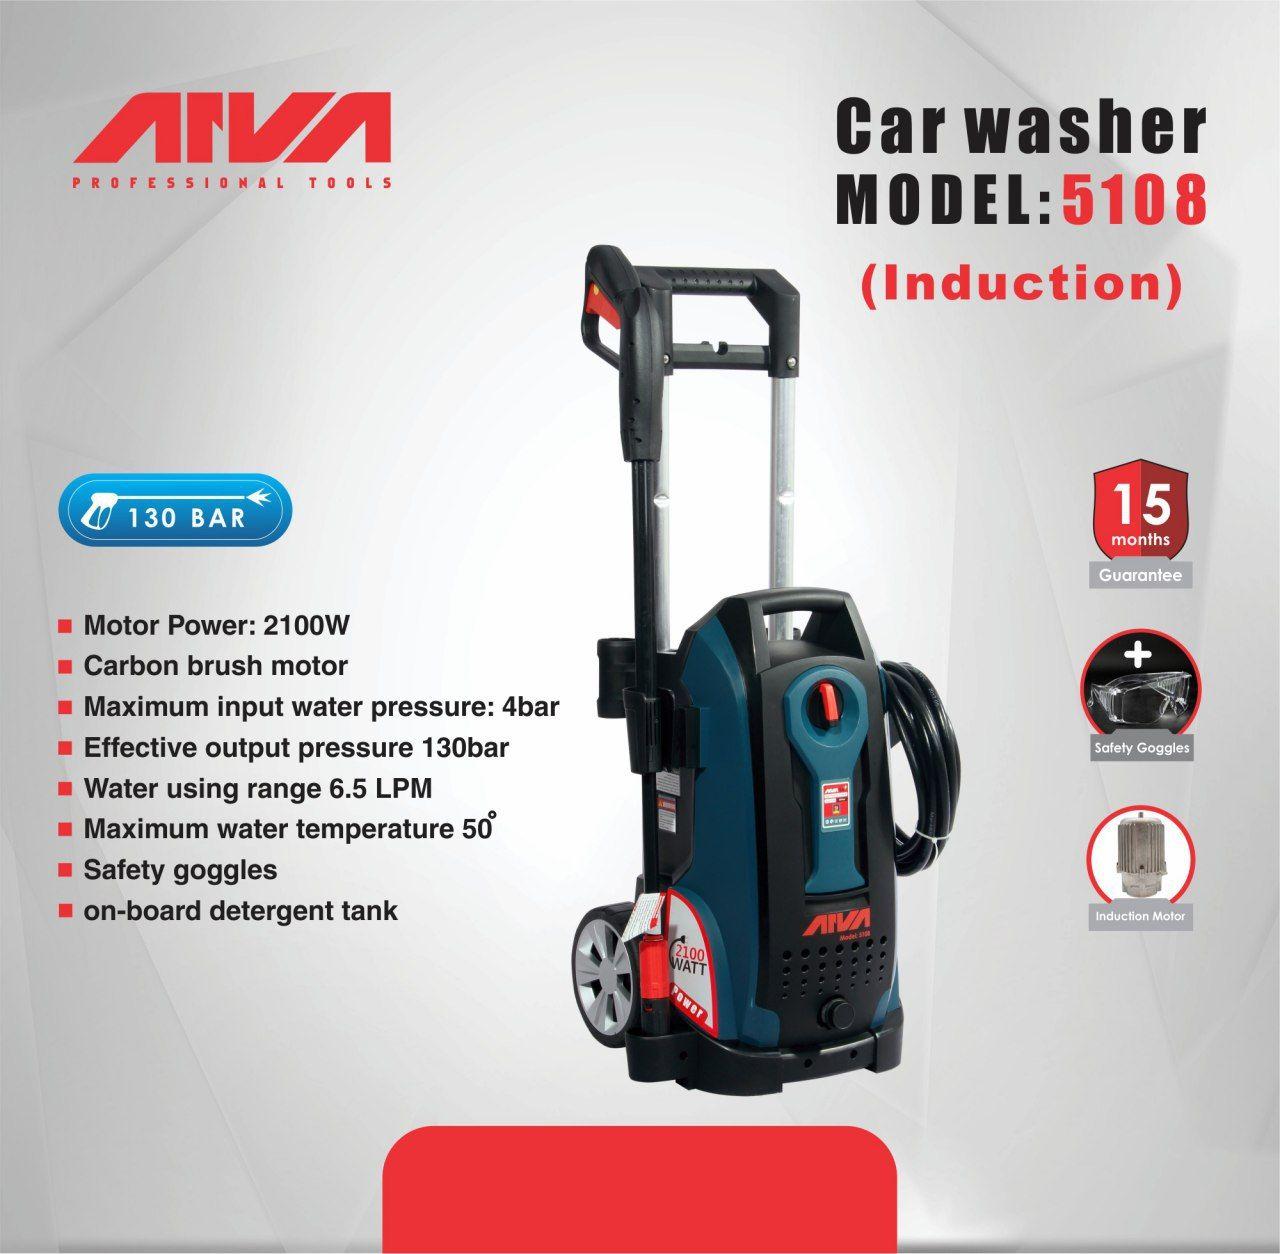 Car Washer 5108 Motor Power 2100w Powerful Dynamic Motor Maximum Input Water Pressure 4bar Effective Output Pressure 130bar Car Washer Car Wash Car Towel